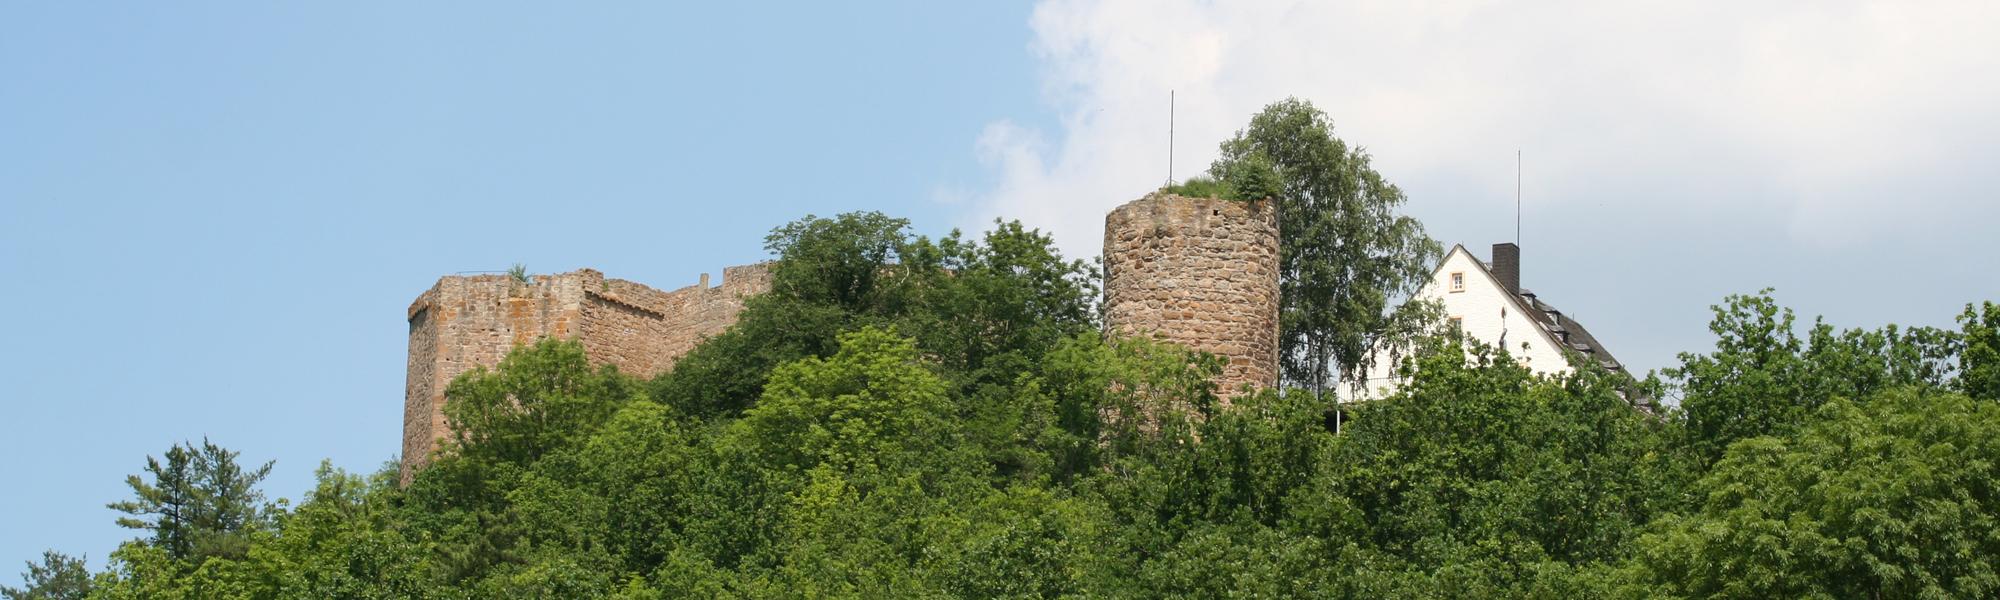 Ruine Kyrburg